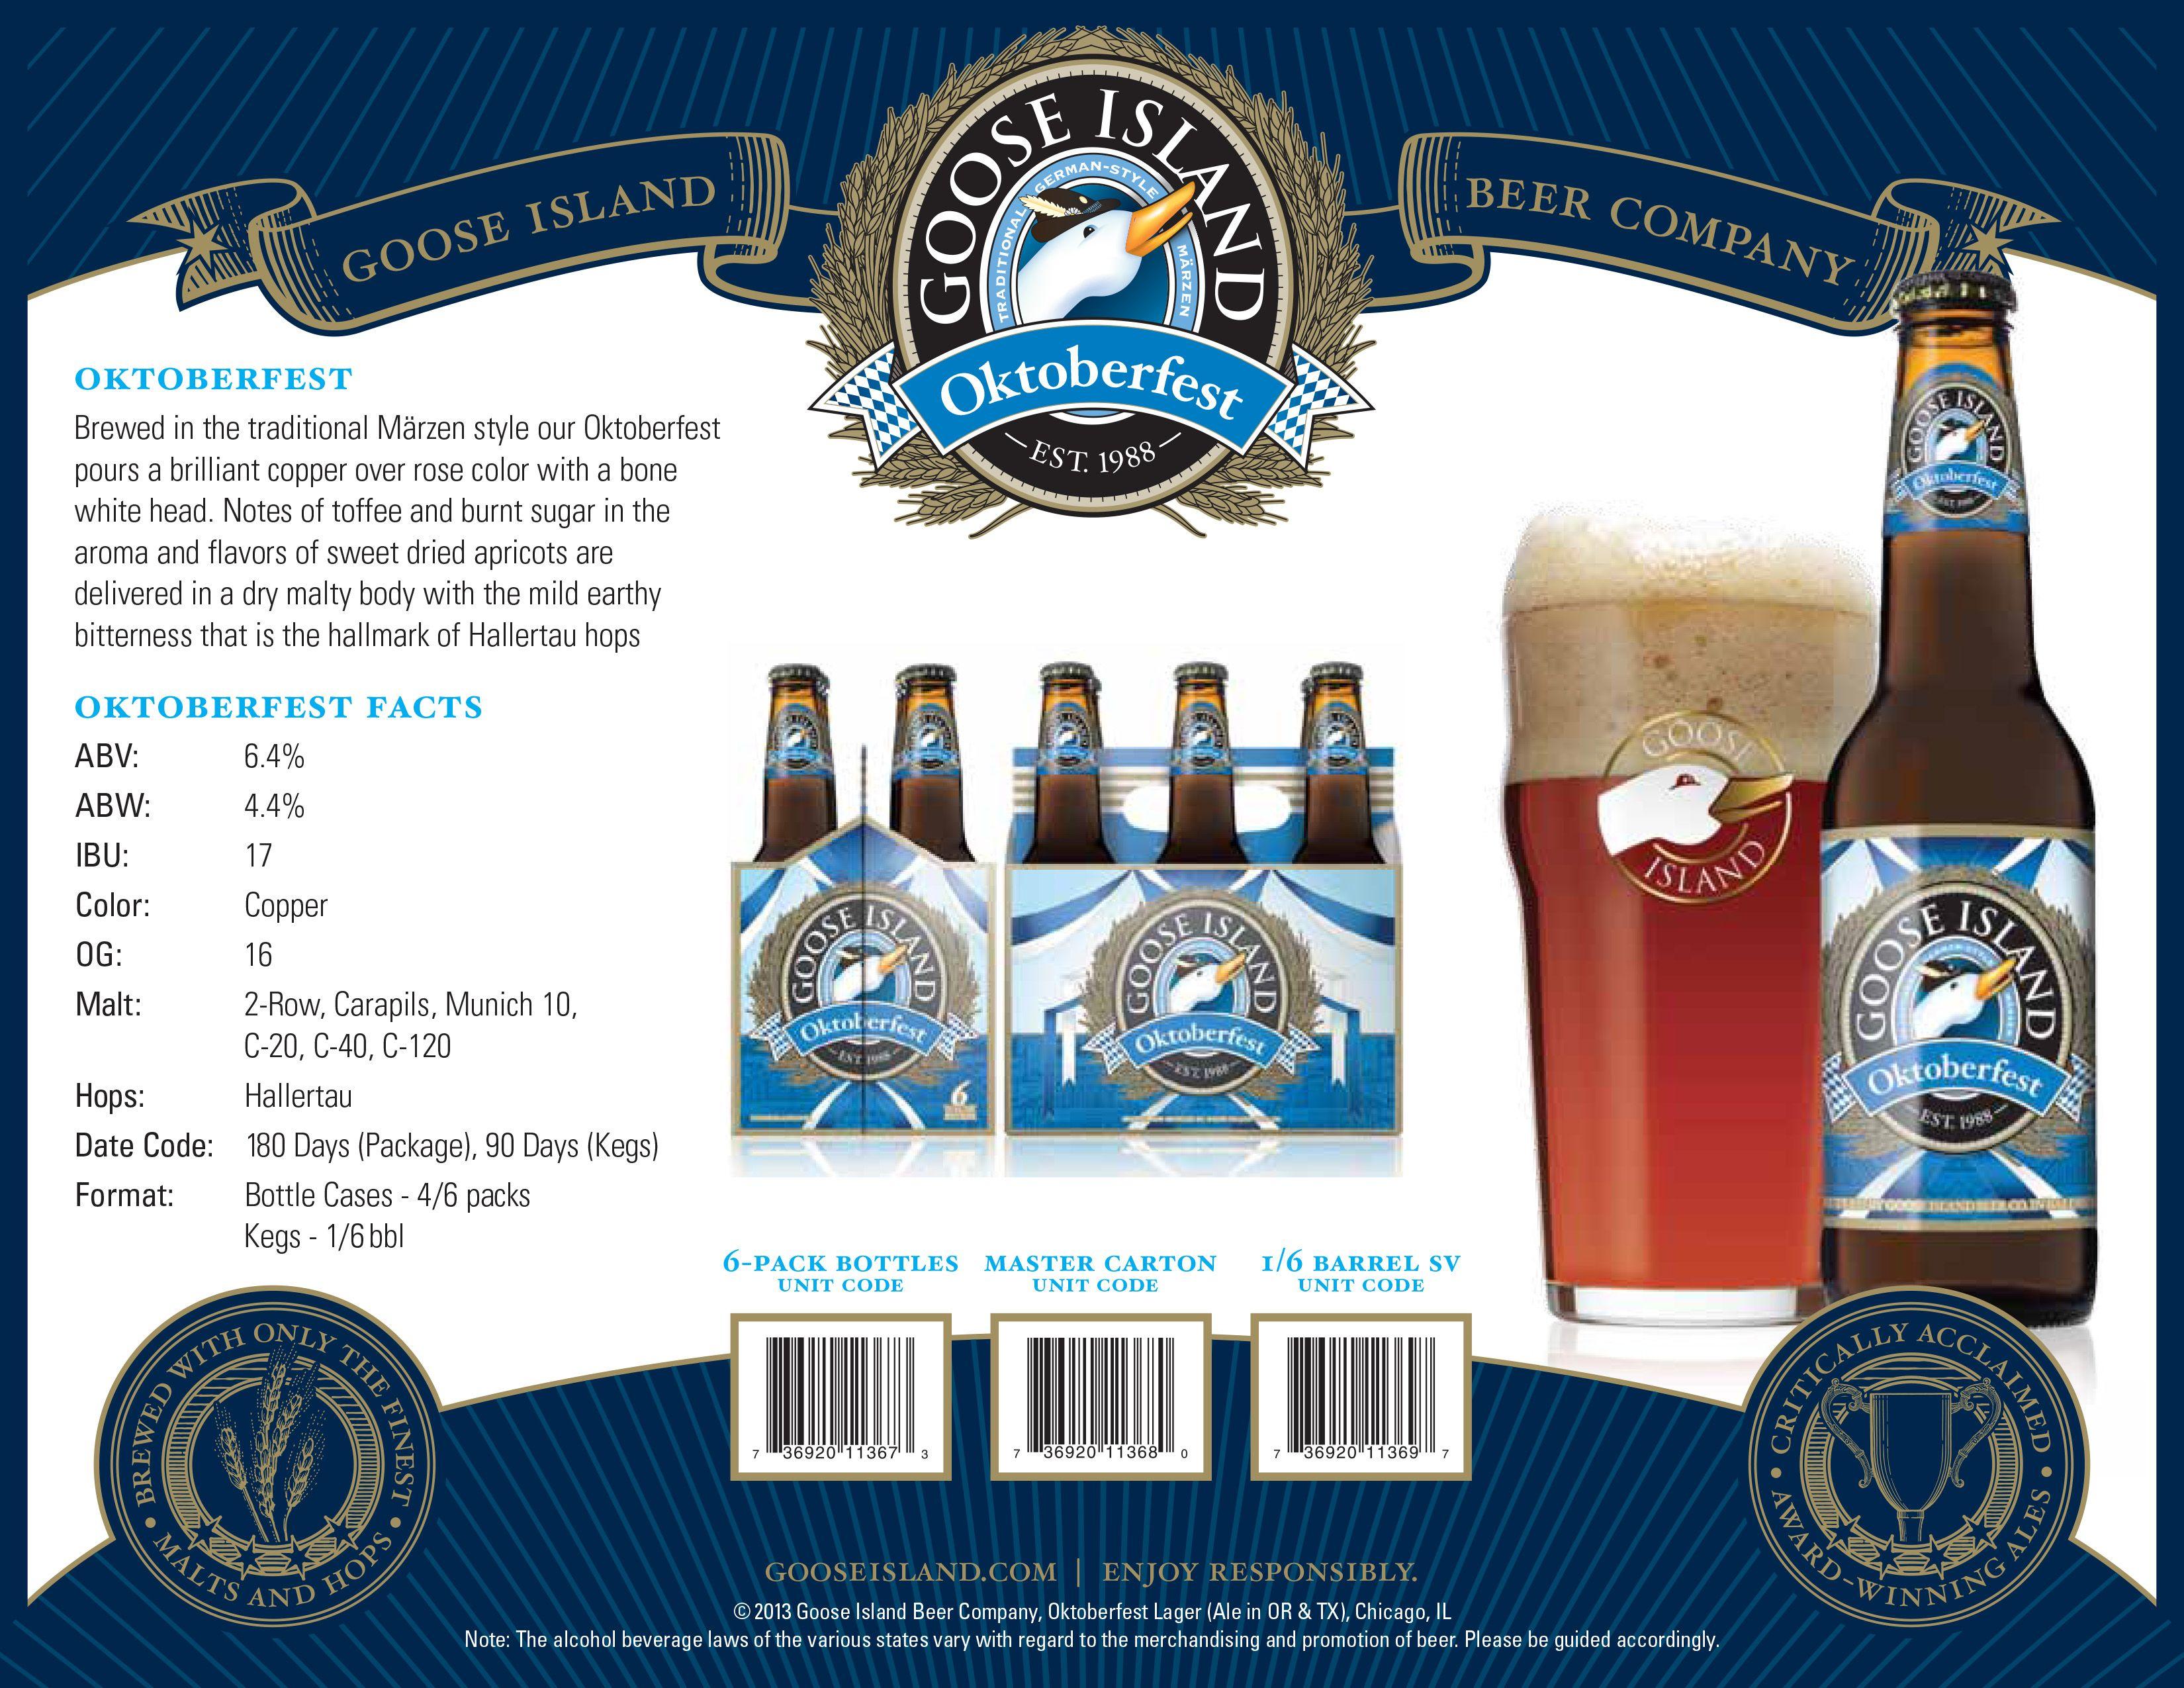 Goose Island Oktoberfest Craft Beer Beer Company Oktoberfest